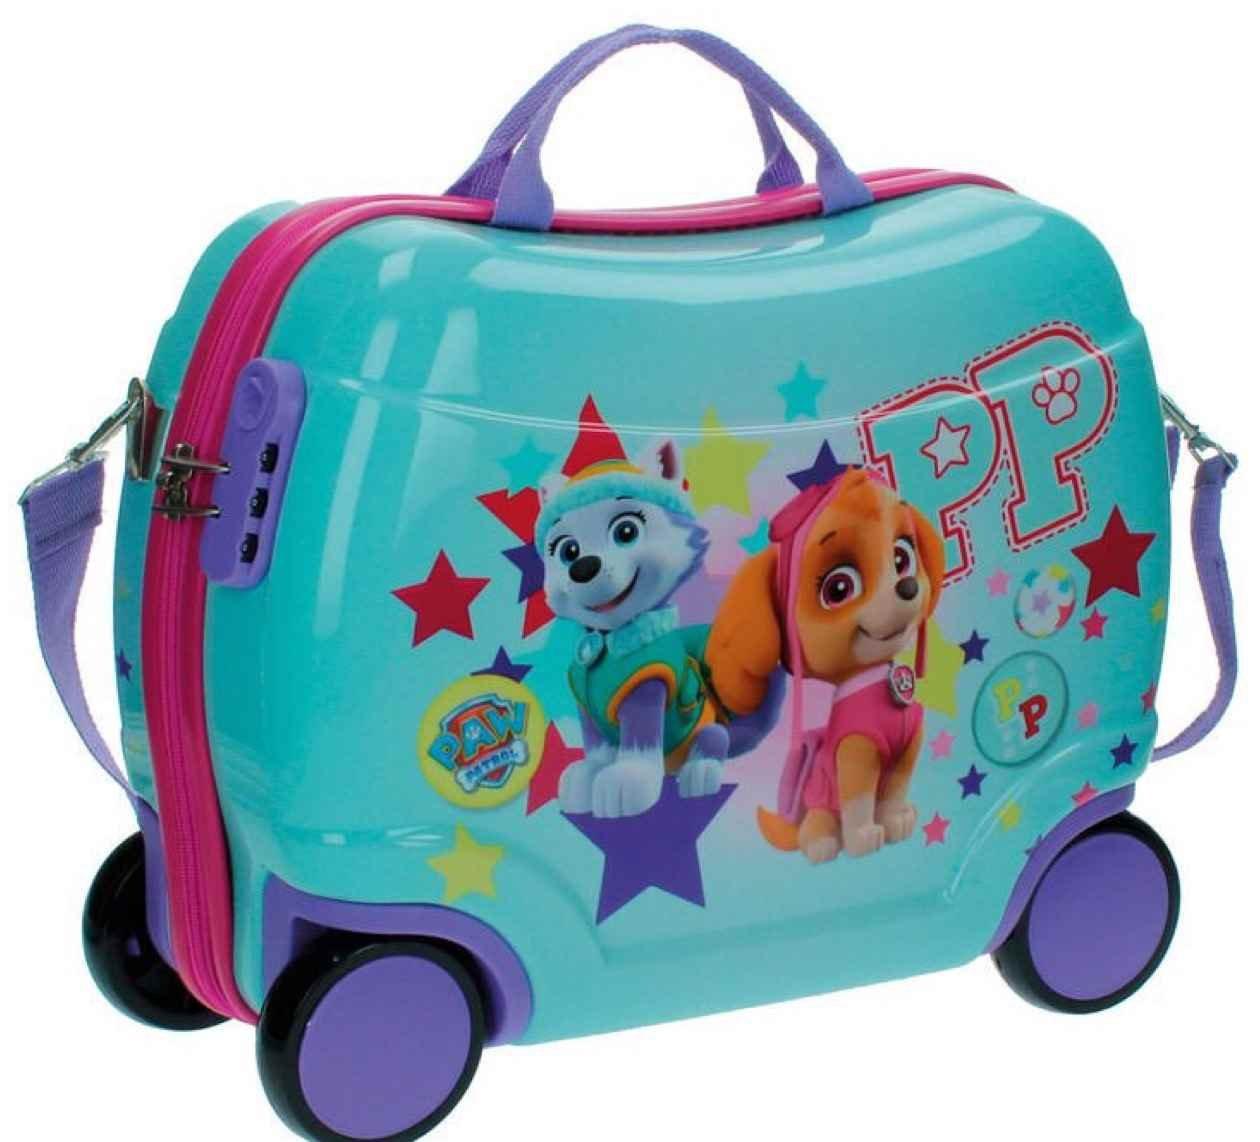 Paw Patrol Sitzkoffer Kindergepäck, 27.88 Liter, Blau